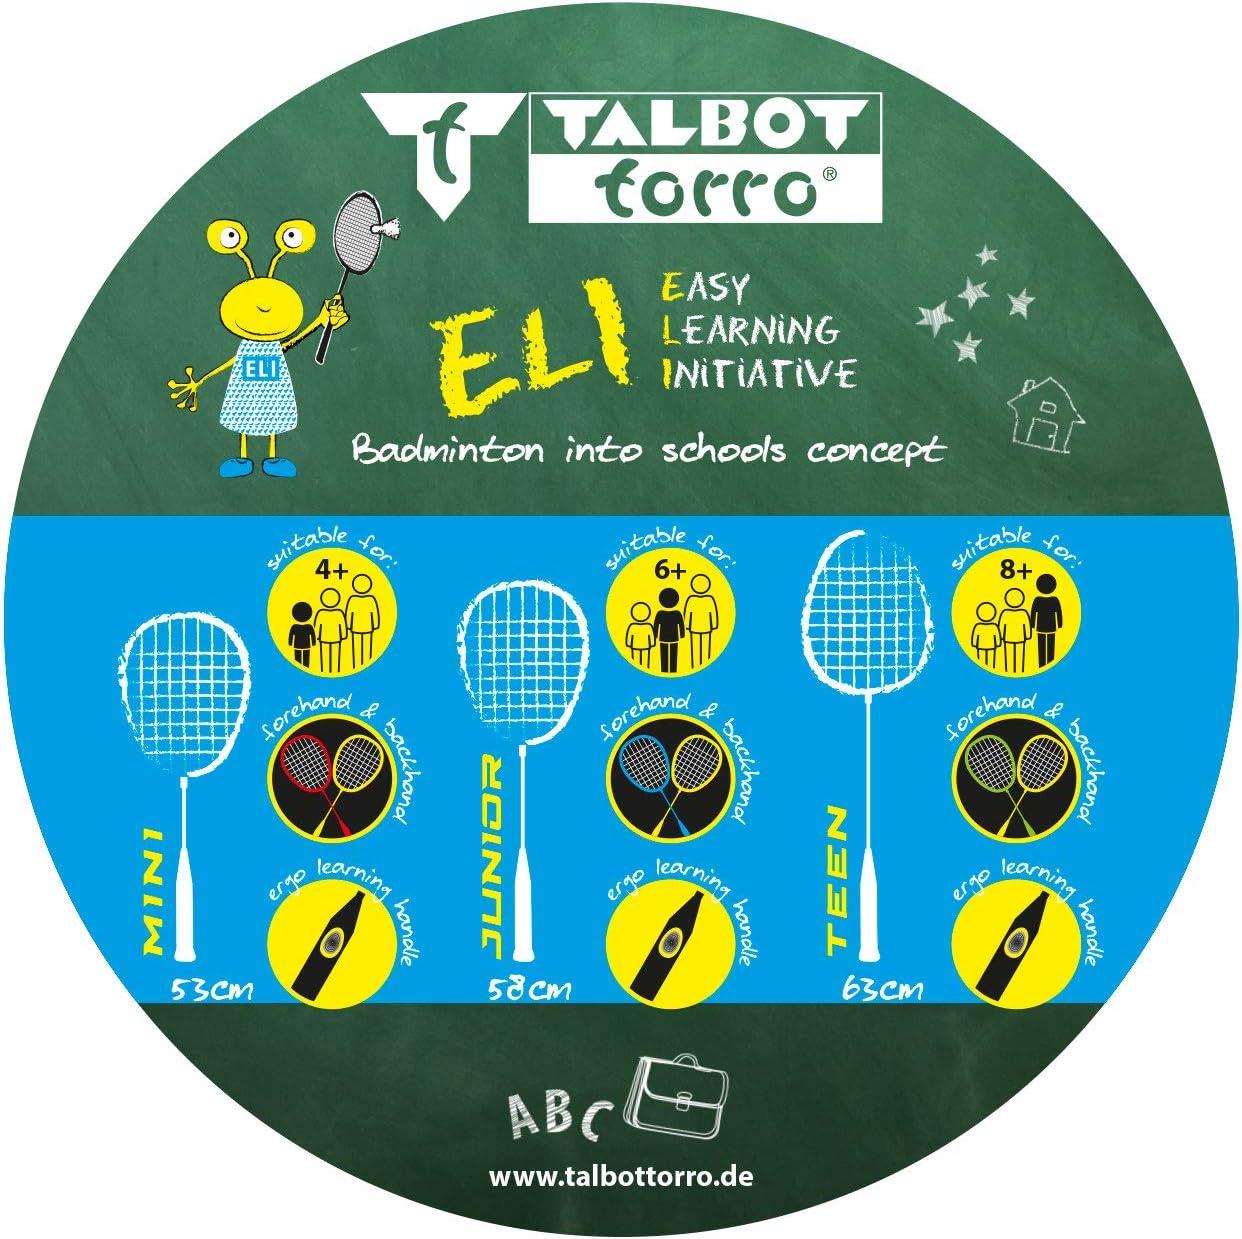 419614 Ideal for Sport and School Training Shortened Length 63 cm Black//Yellow//Green Talbot Torro ELI Teen Badminton Learning Racket Learning Handle Isometric Head